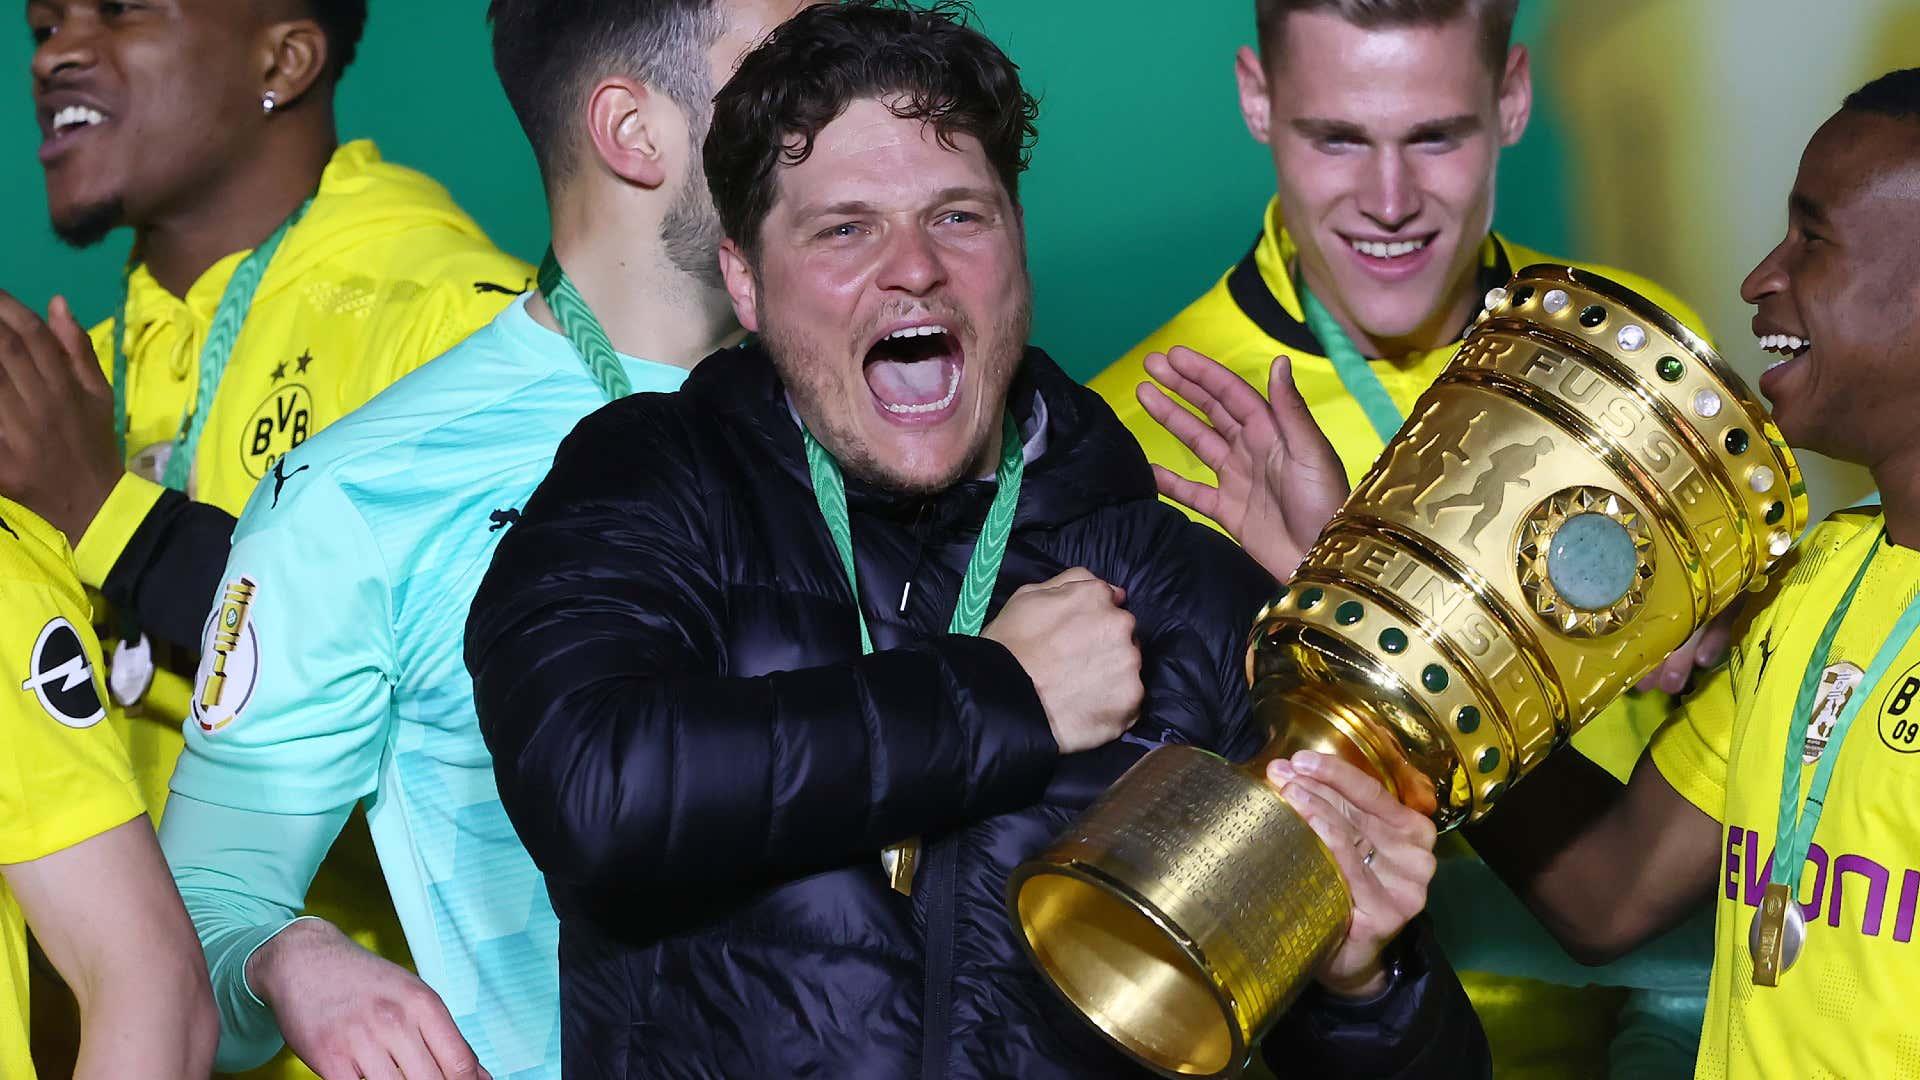 BVB, News und Gerüchte heute: Terzic als Van-Bommel-Nachfolger in Wolfsburg gehandelt, Haaland-Verletzung offenbar schlimmer als gedacht | Goal.com